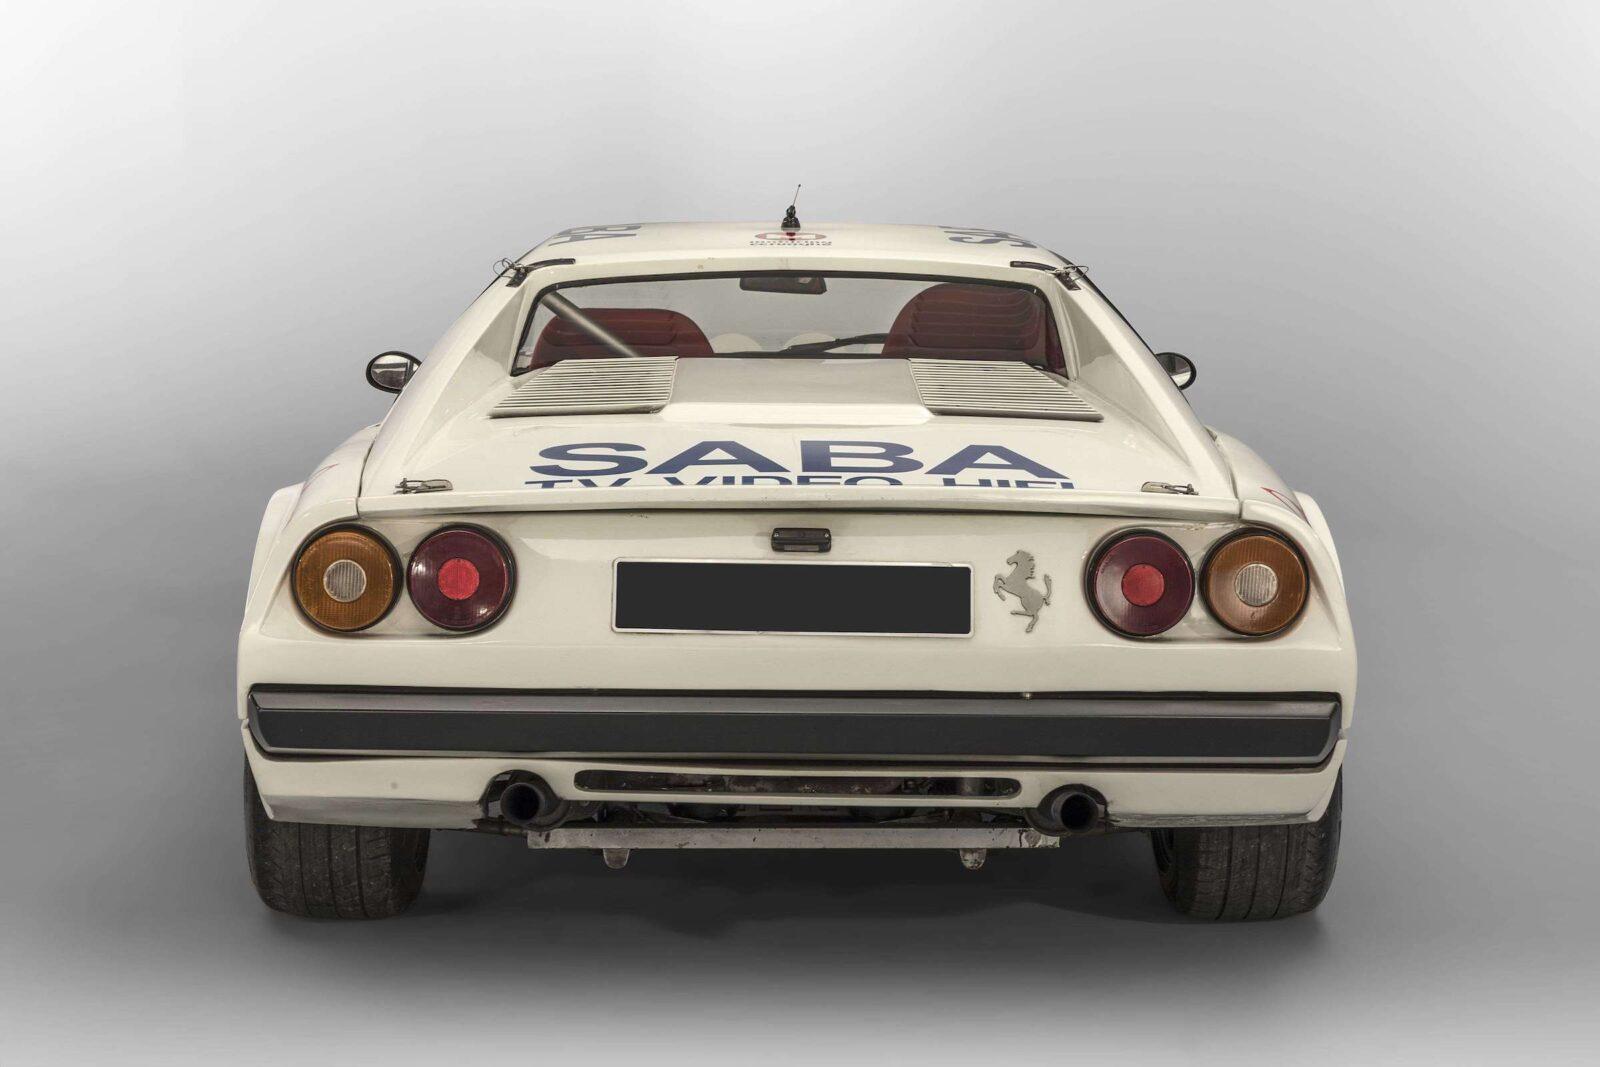 Ferrari 308 GTB Rear